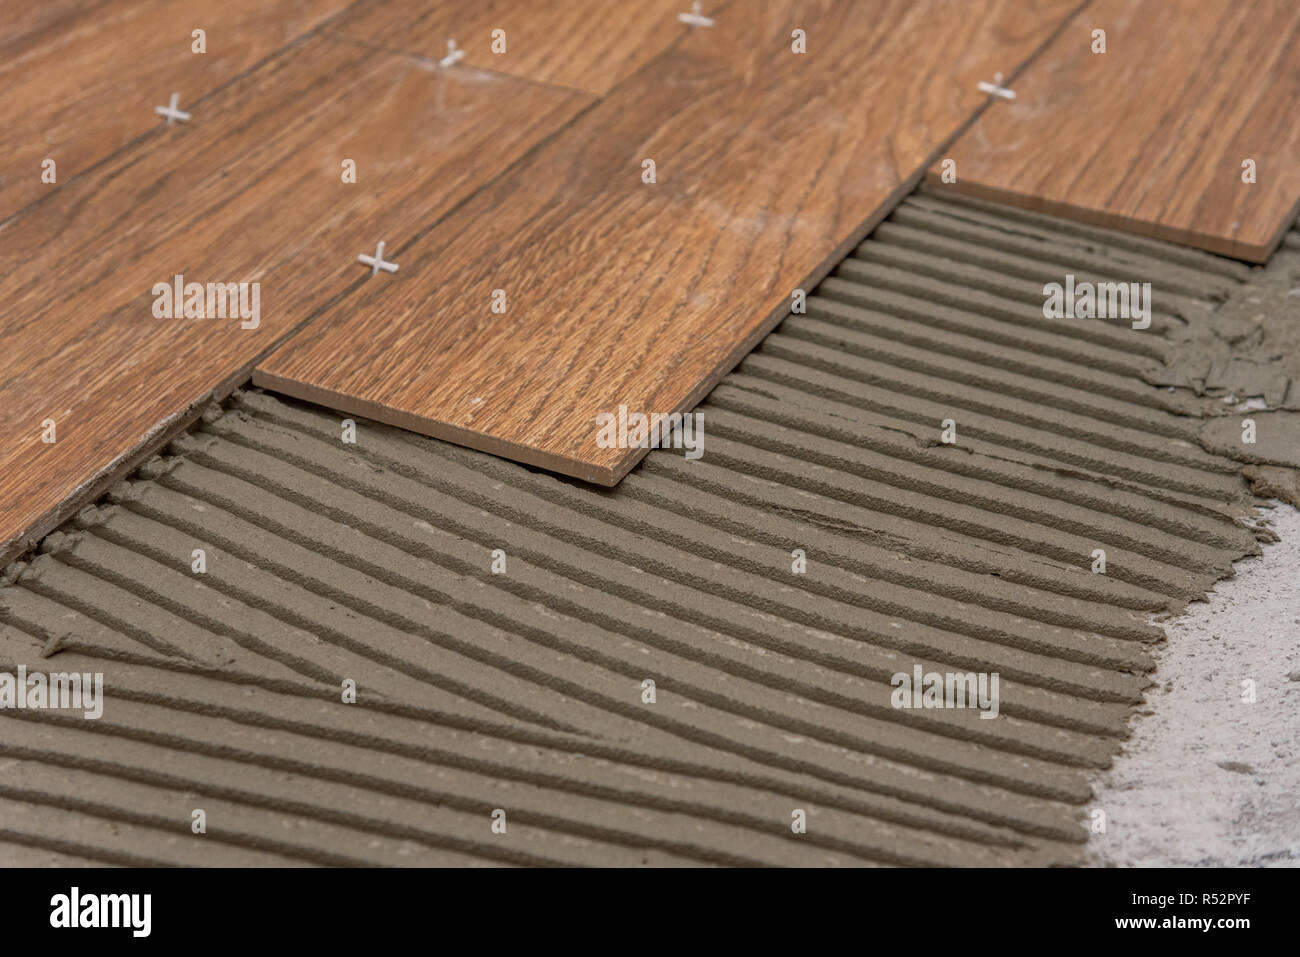 https www alamy com ceramic tiles and tools for tiler floor tiles installation home improvement renovation ceramic tile floor adhesive mortar level image226869987 html